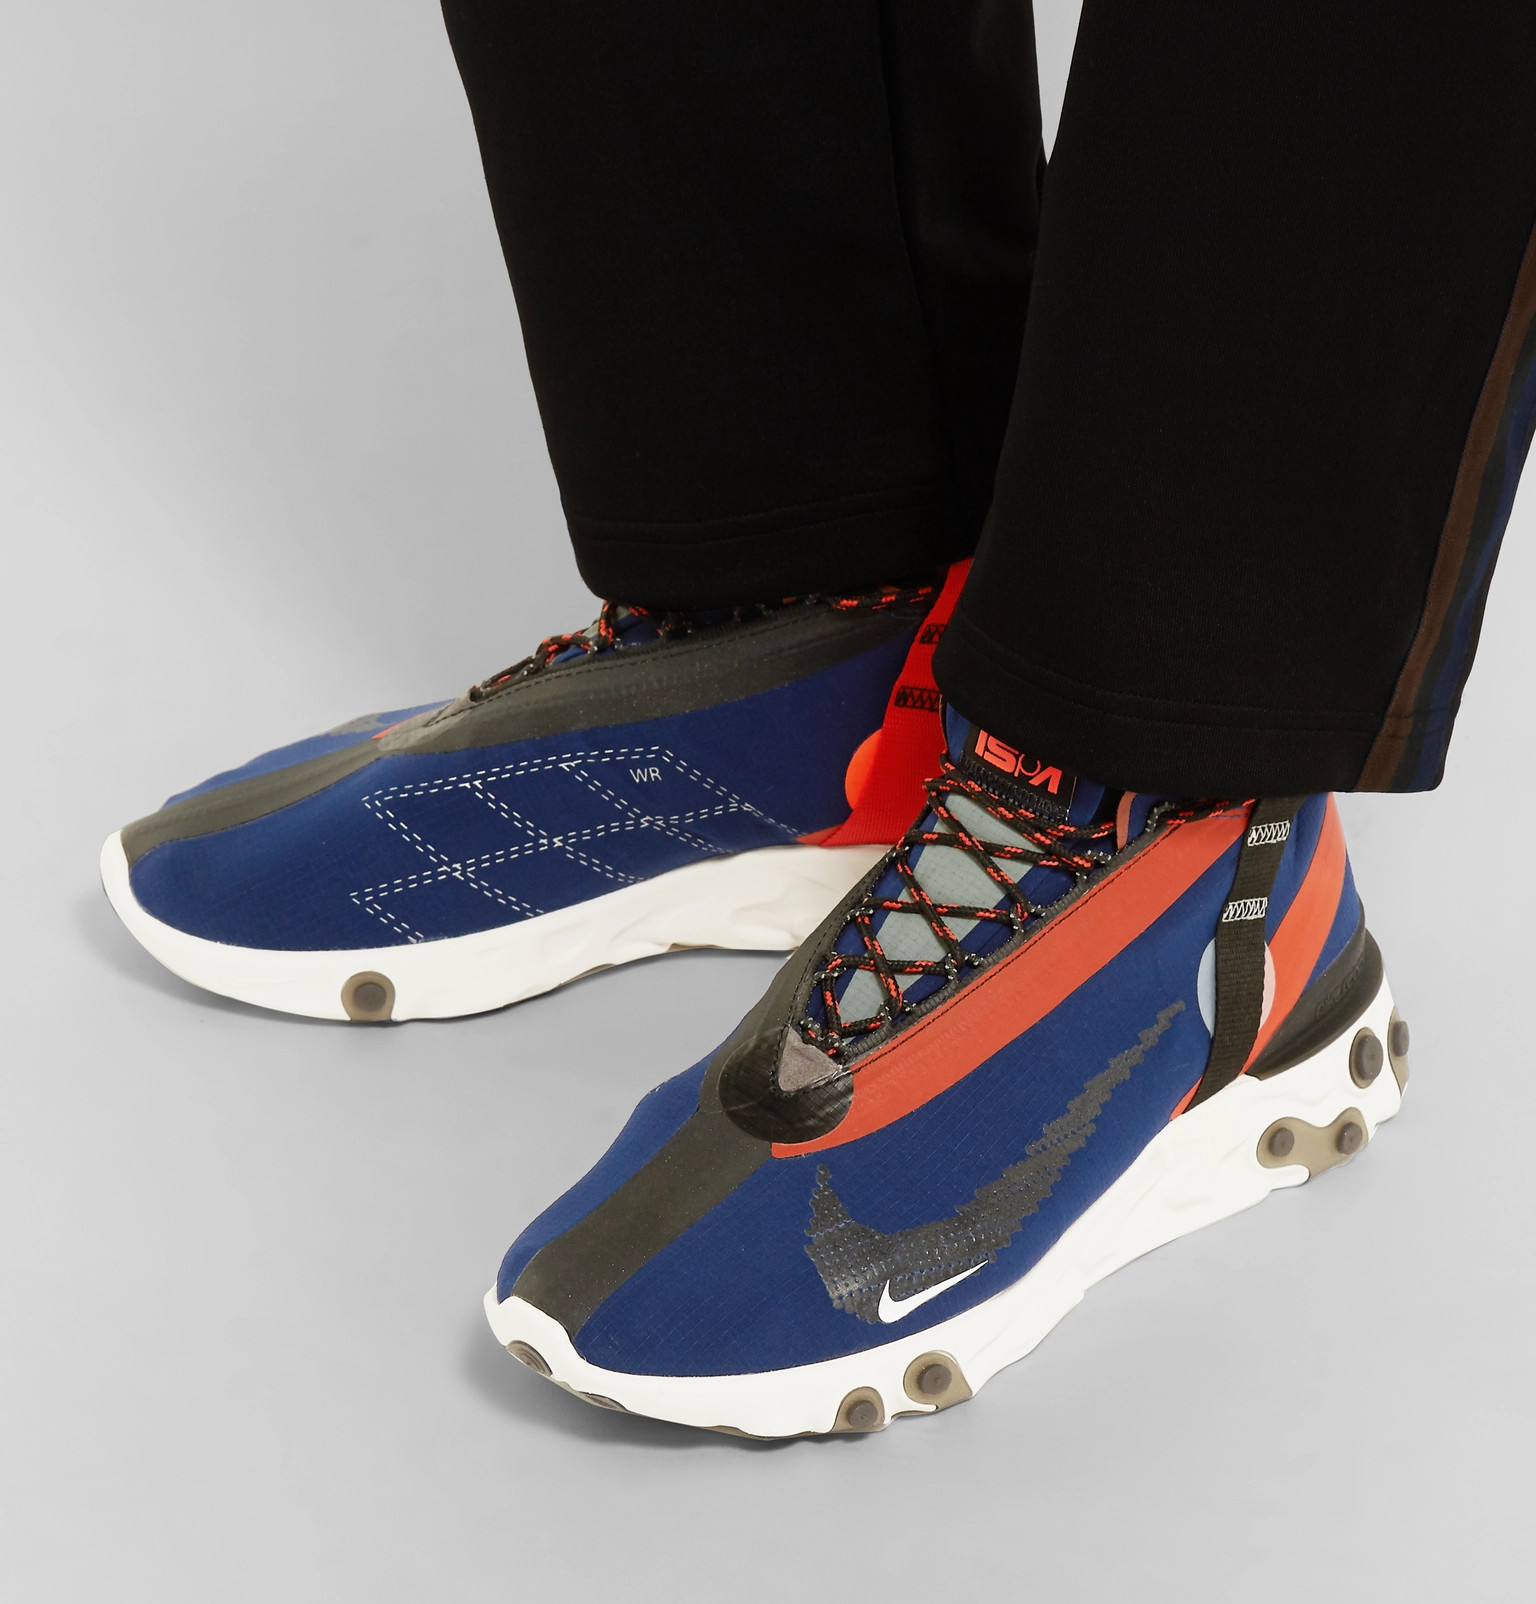 bd985f1eb9b Nike - React Runner Mid WR ISPA Ripstop Sneakers